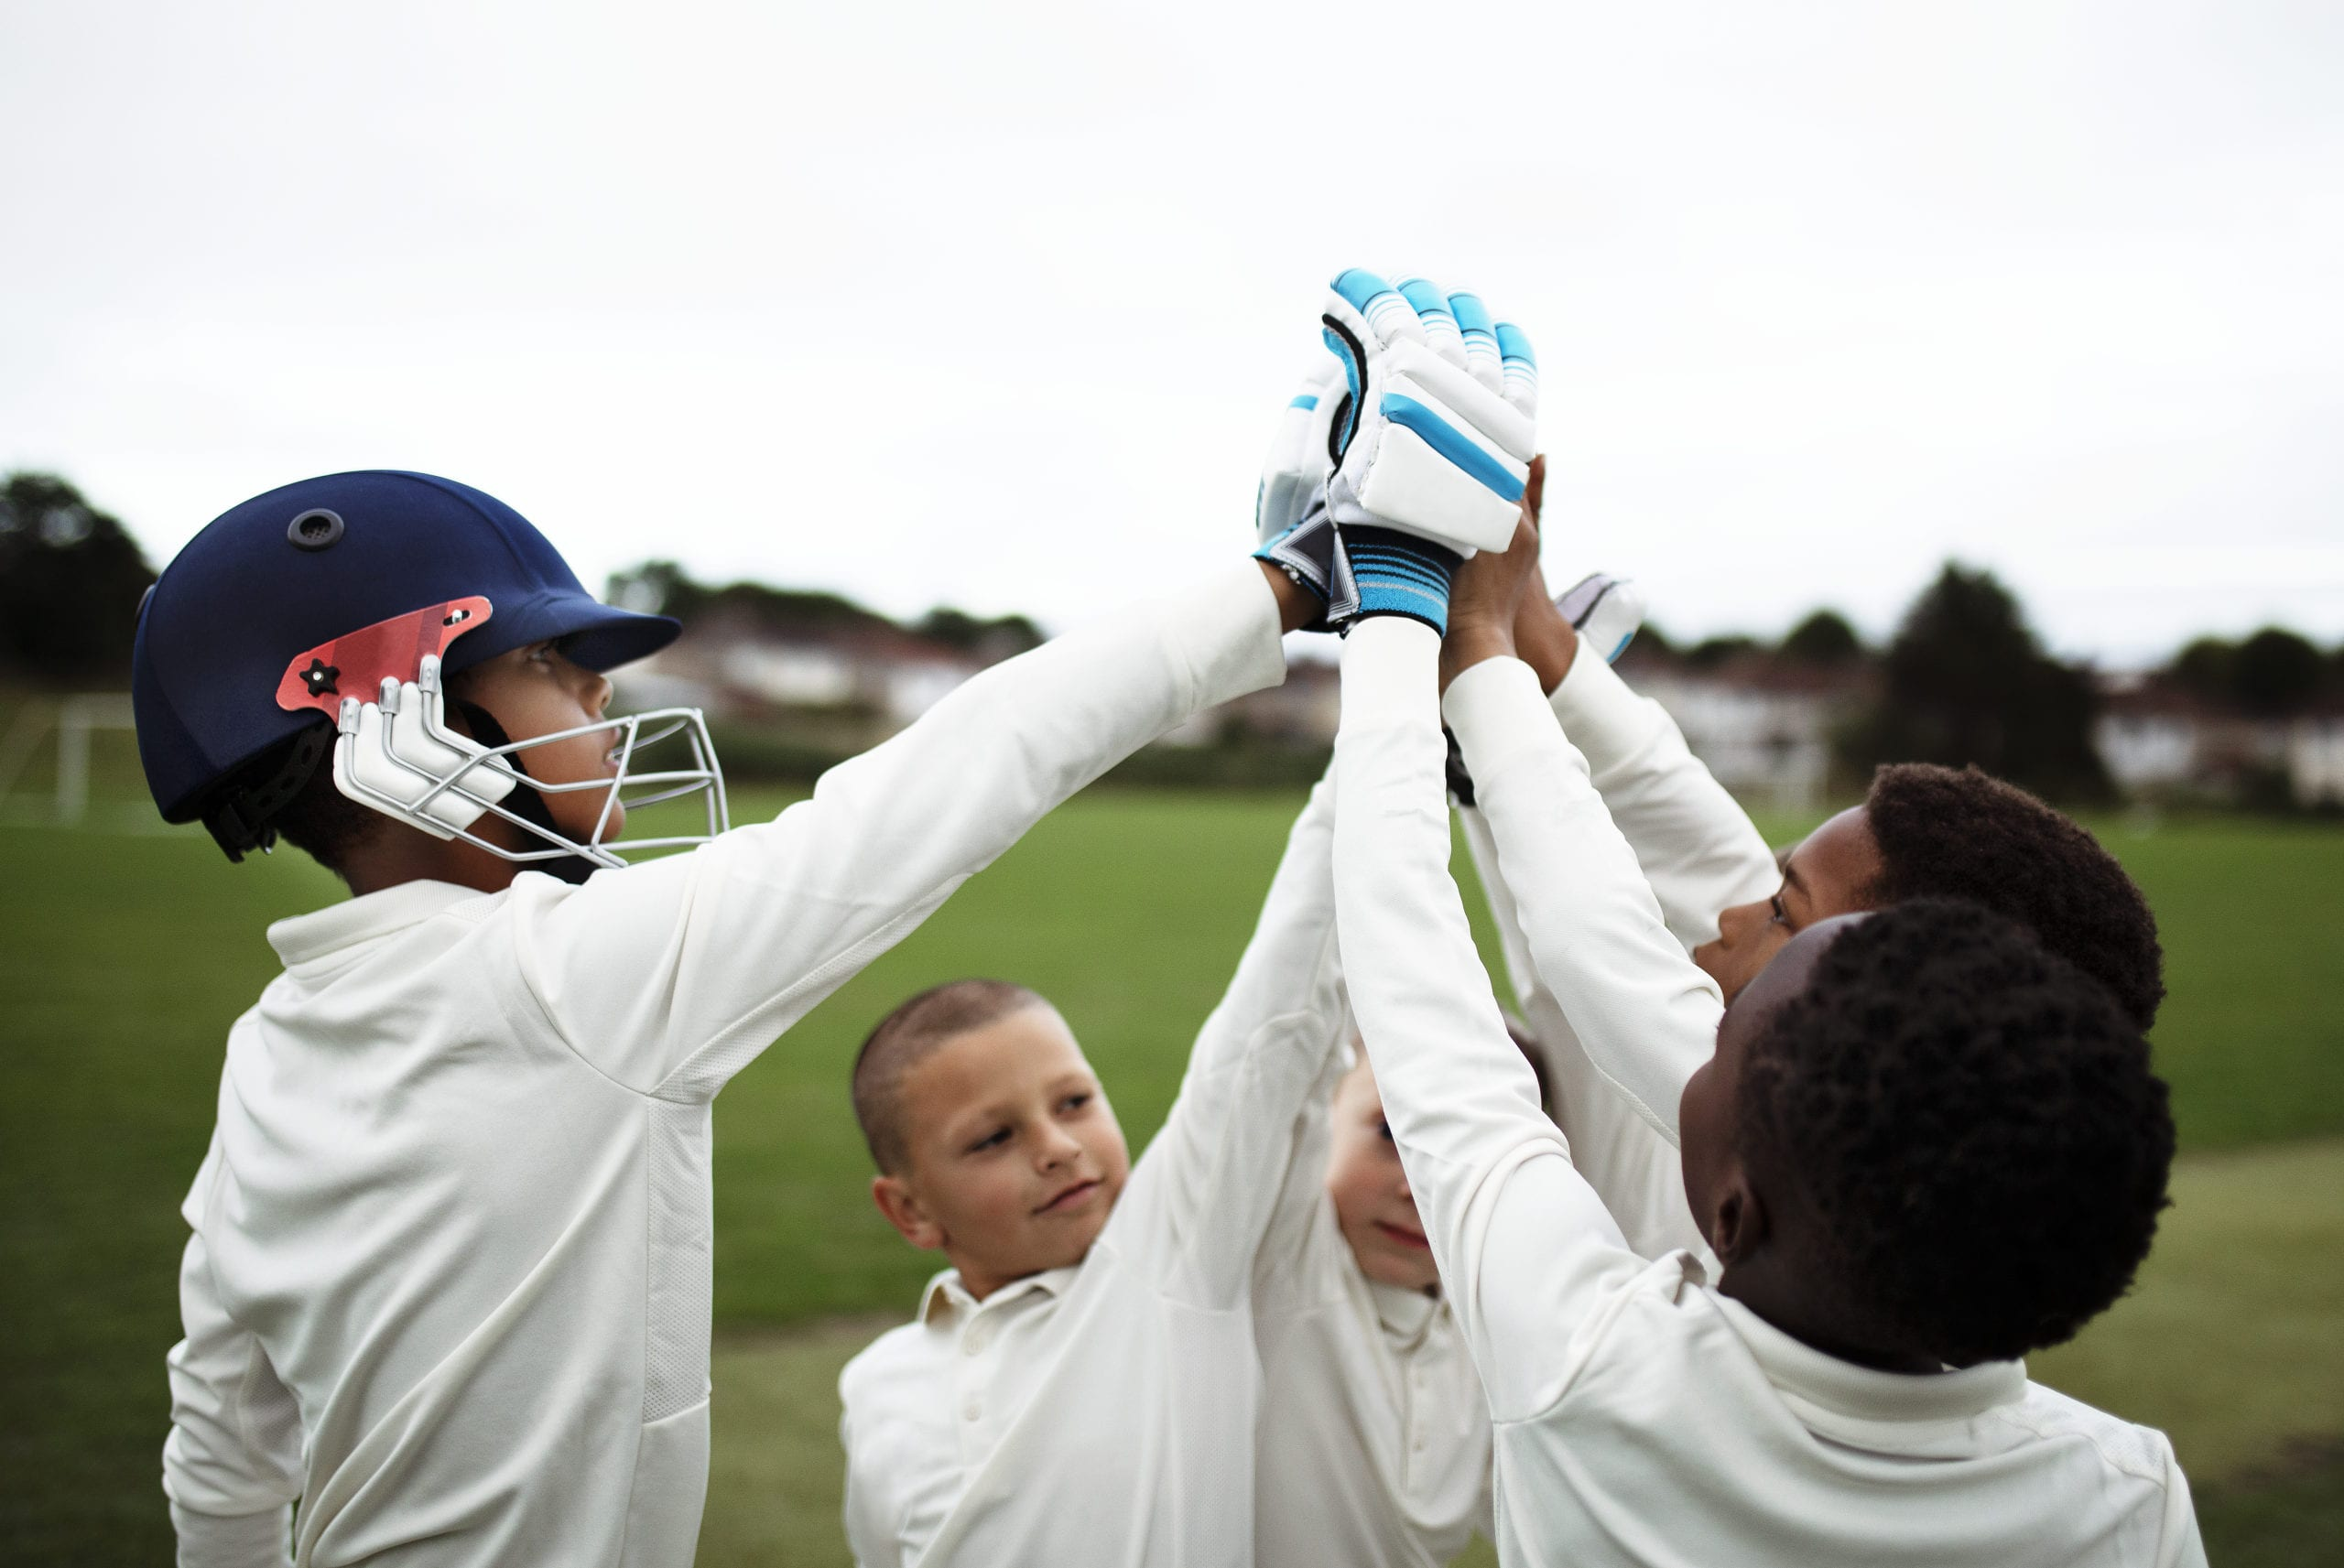 5 kids in cricket gear high fiving